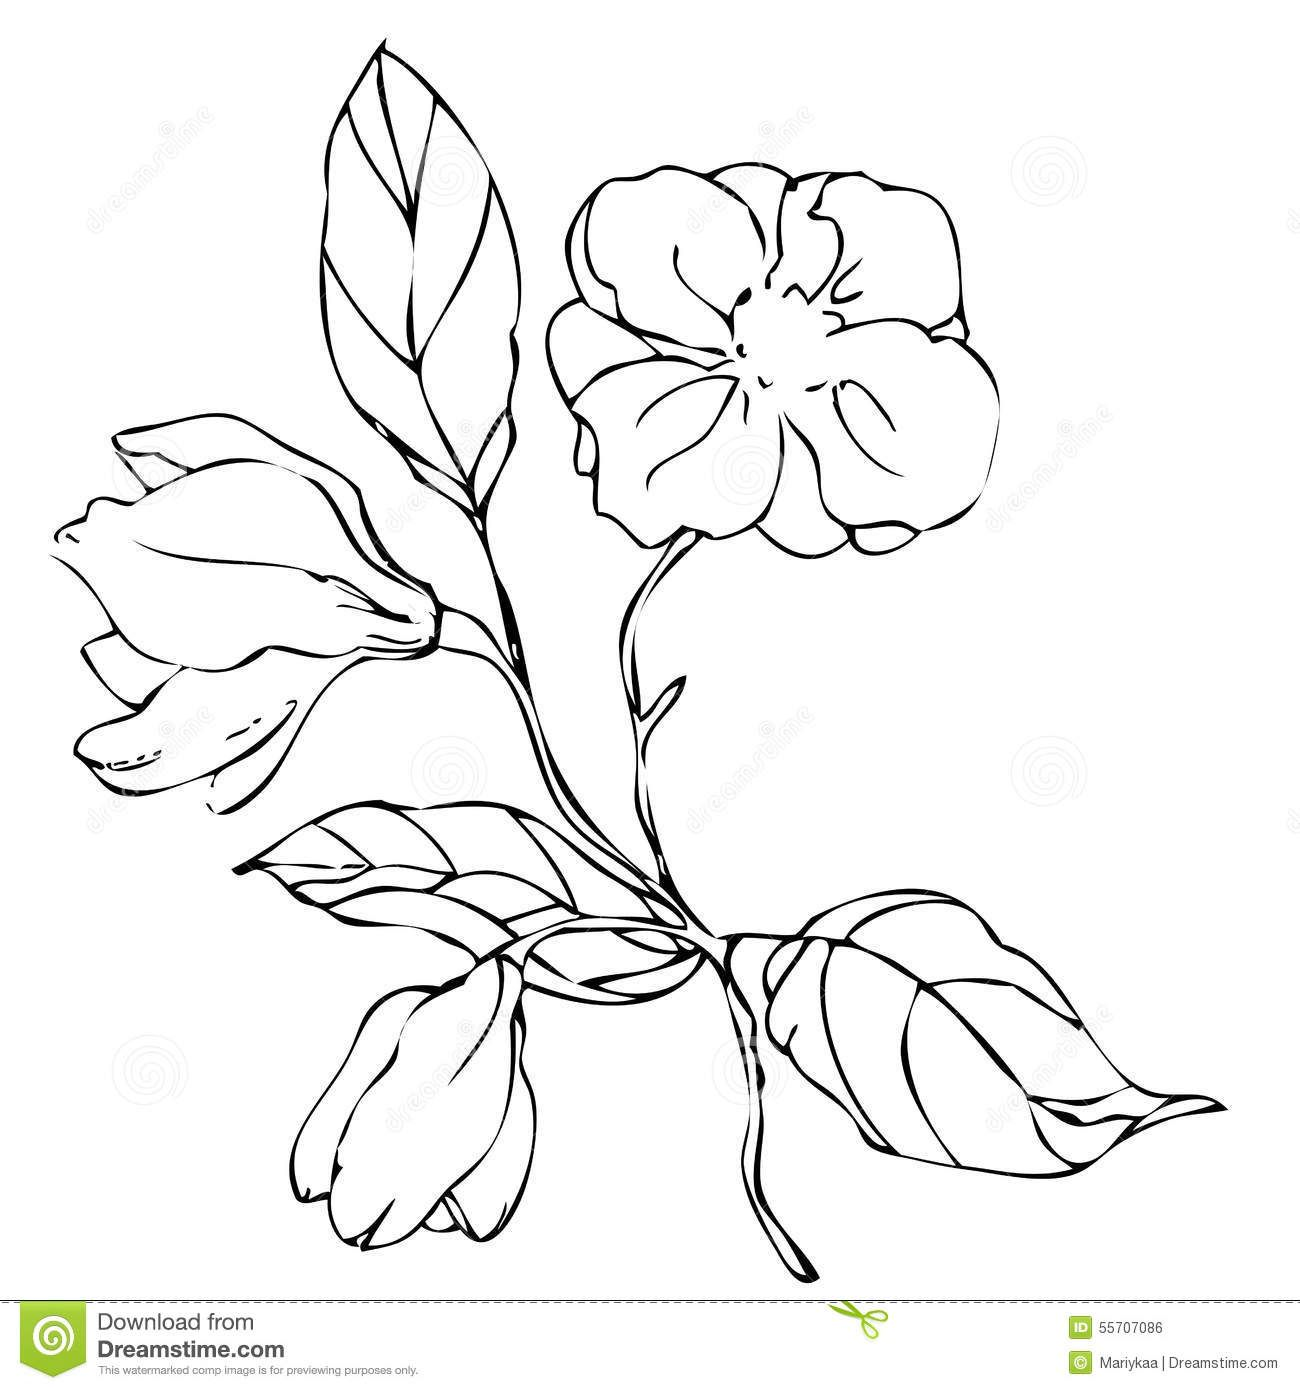 dibujos de flores de enredadera - Buscar con Google